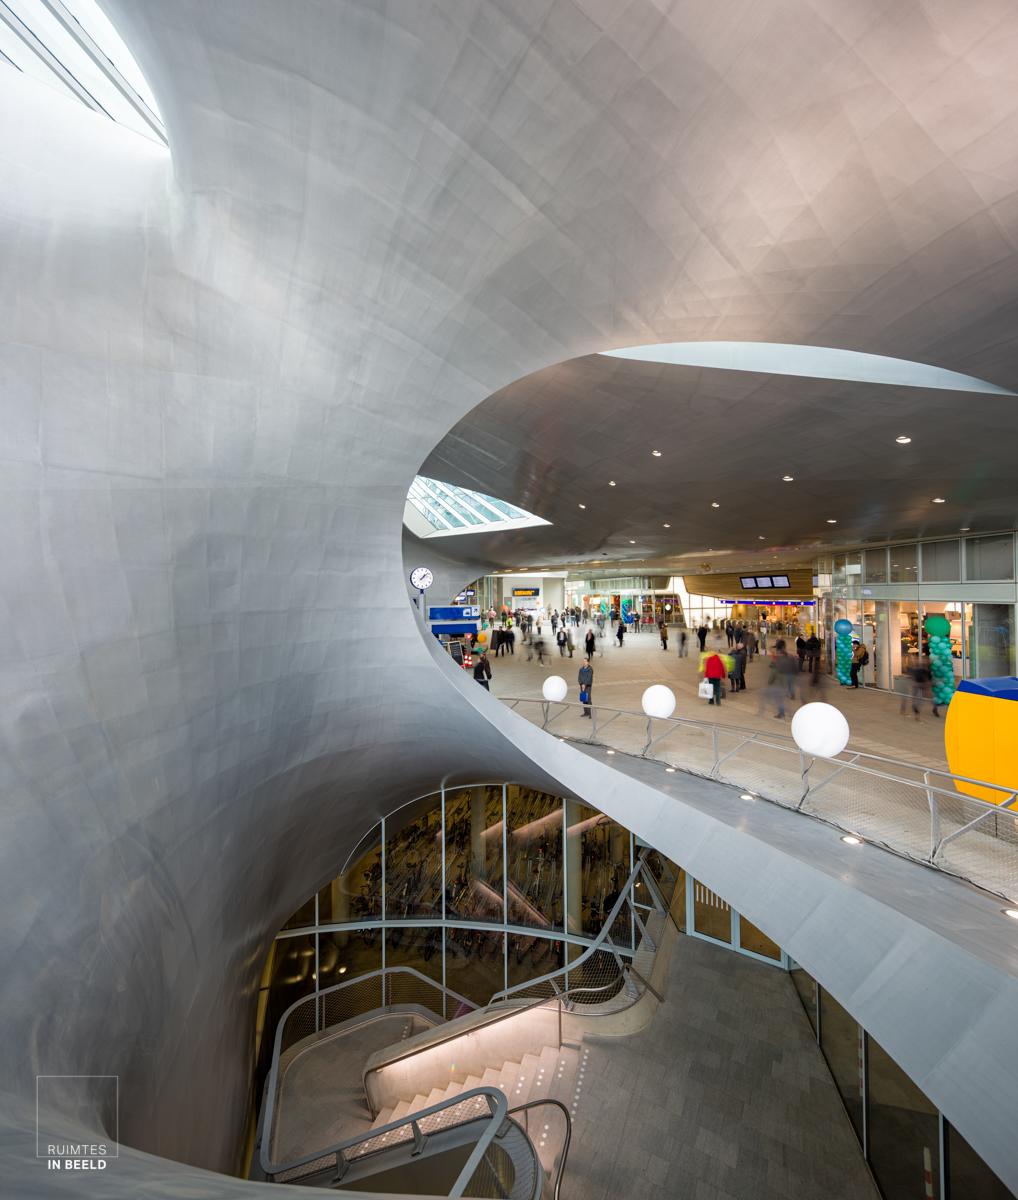 Interieur van het nieuwe Centraal Station in Arnhem | Interior of the newly build Central Station in Arnhem, Netherlands.